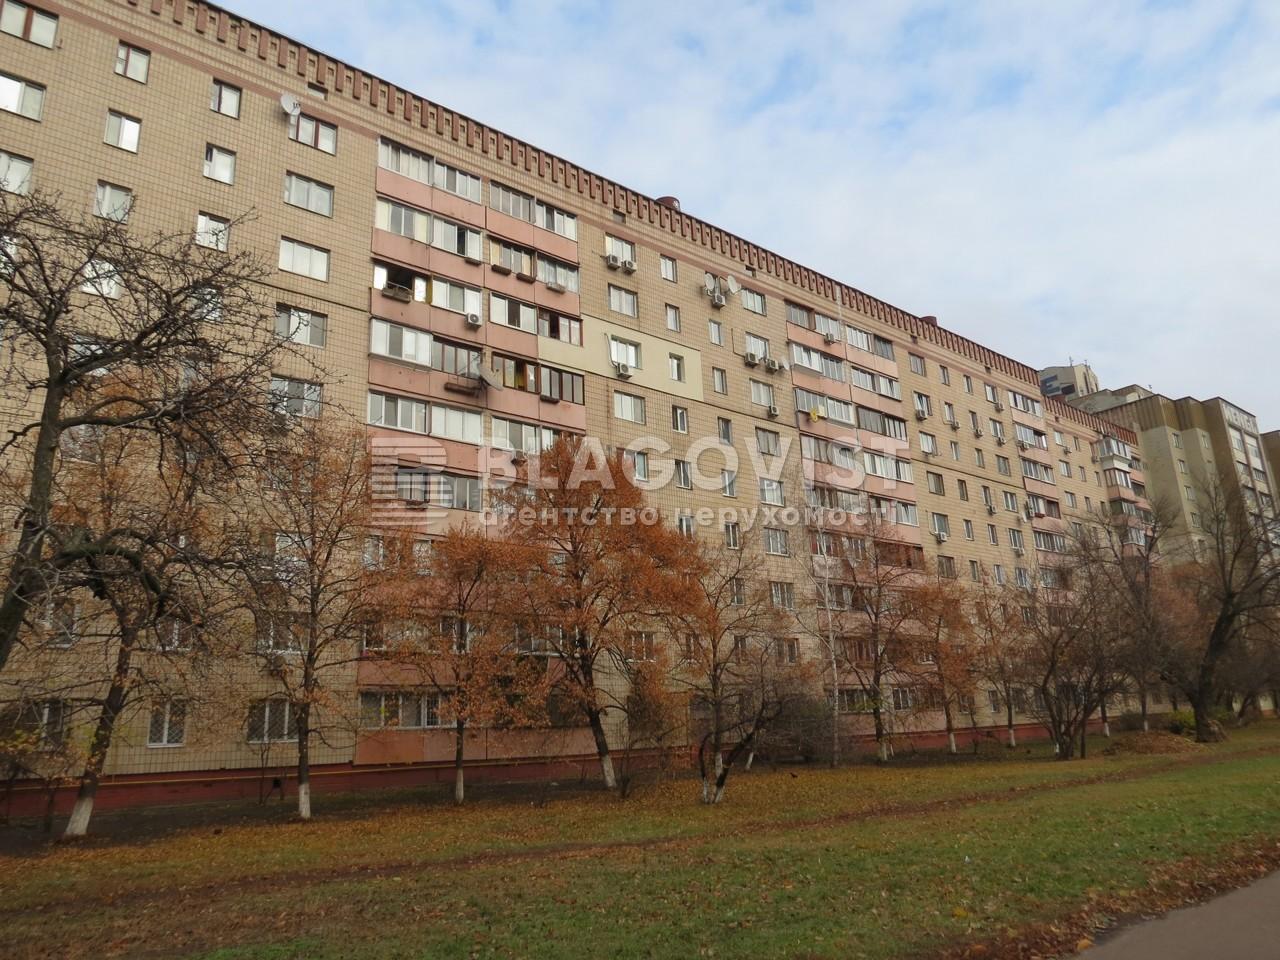 Квартира C-101846, Харьковское шоссе, 55, Киев - Фото 1